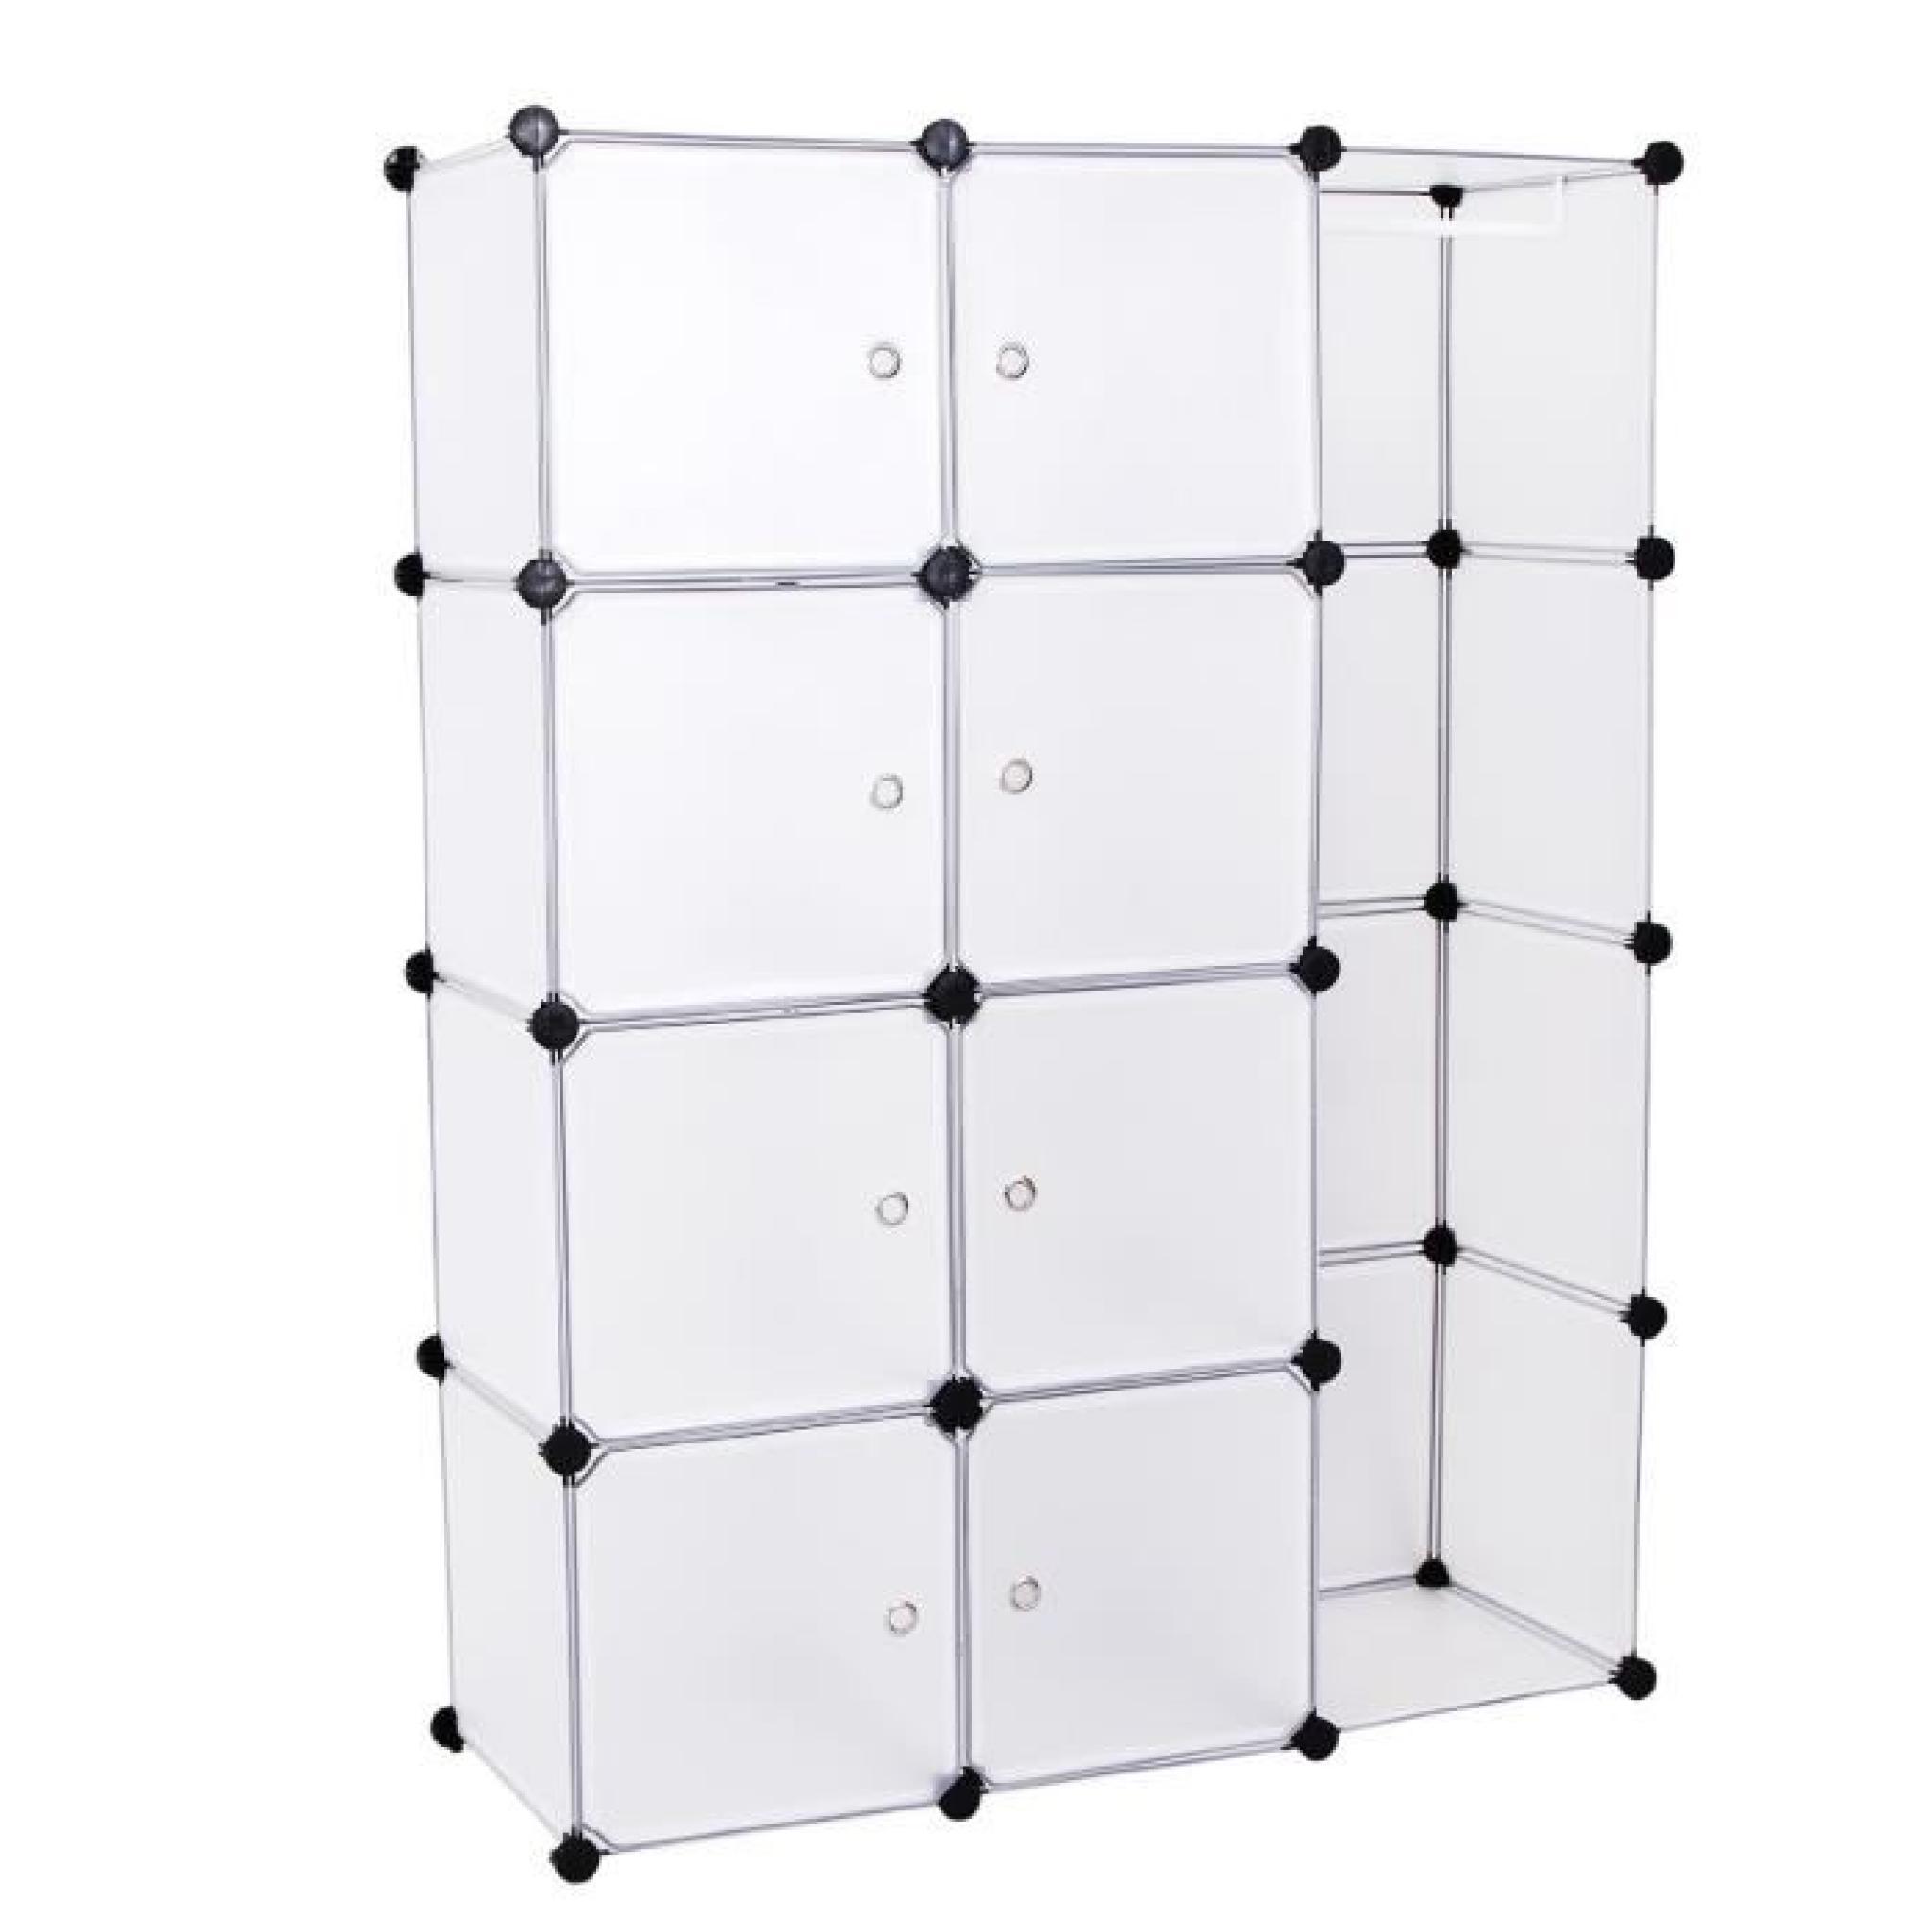 armoire etagere penderie modulable achat vente dressing. Black Bedroom Furniture Sets. Home Design Ideas